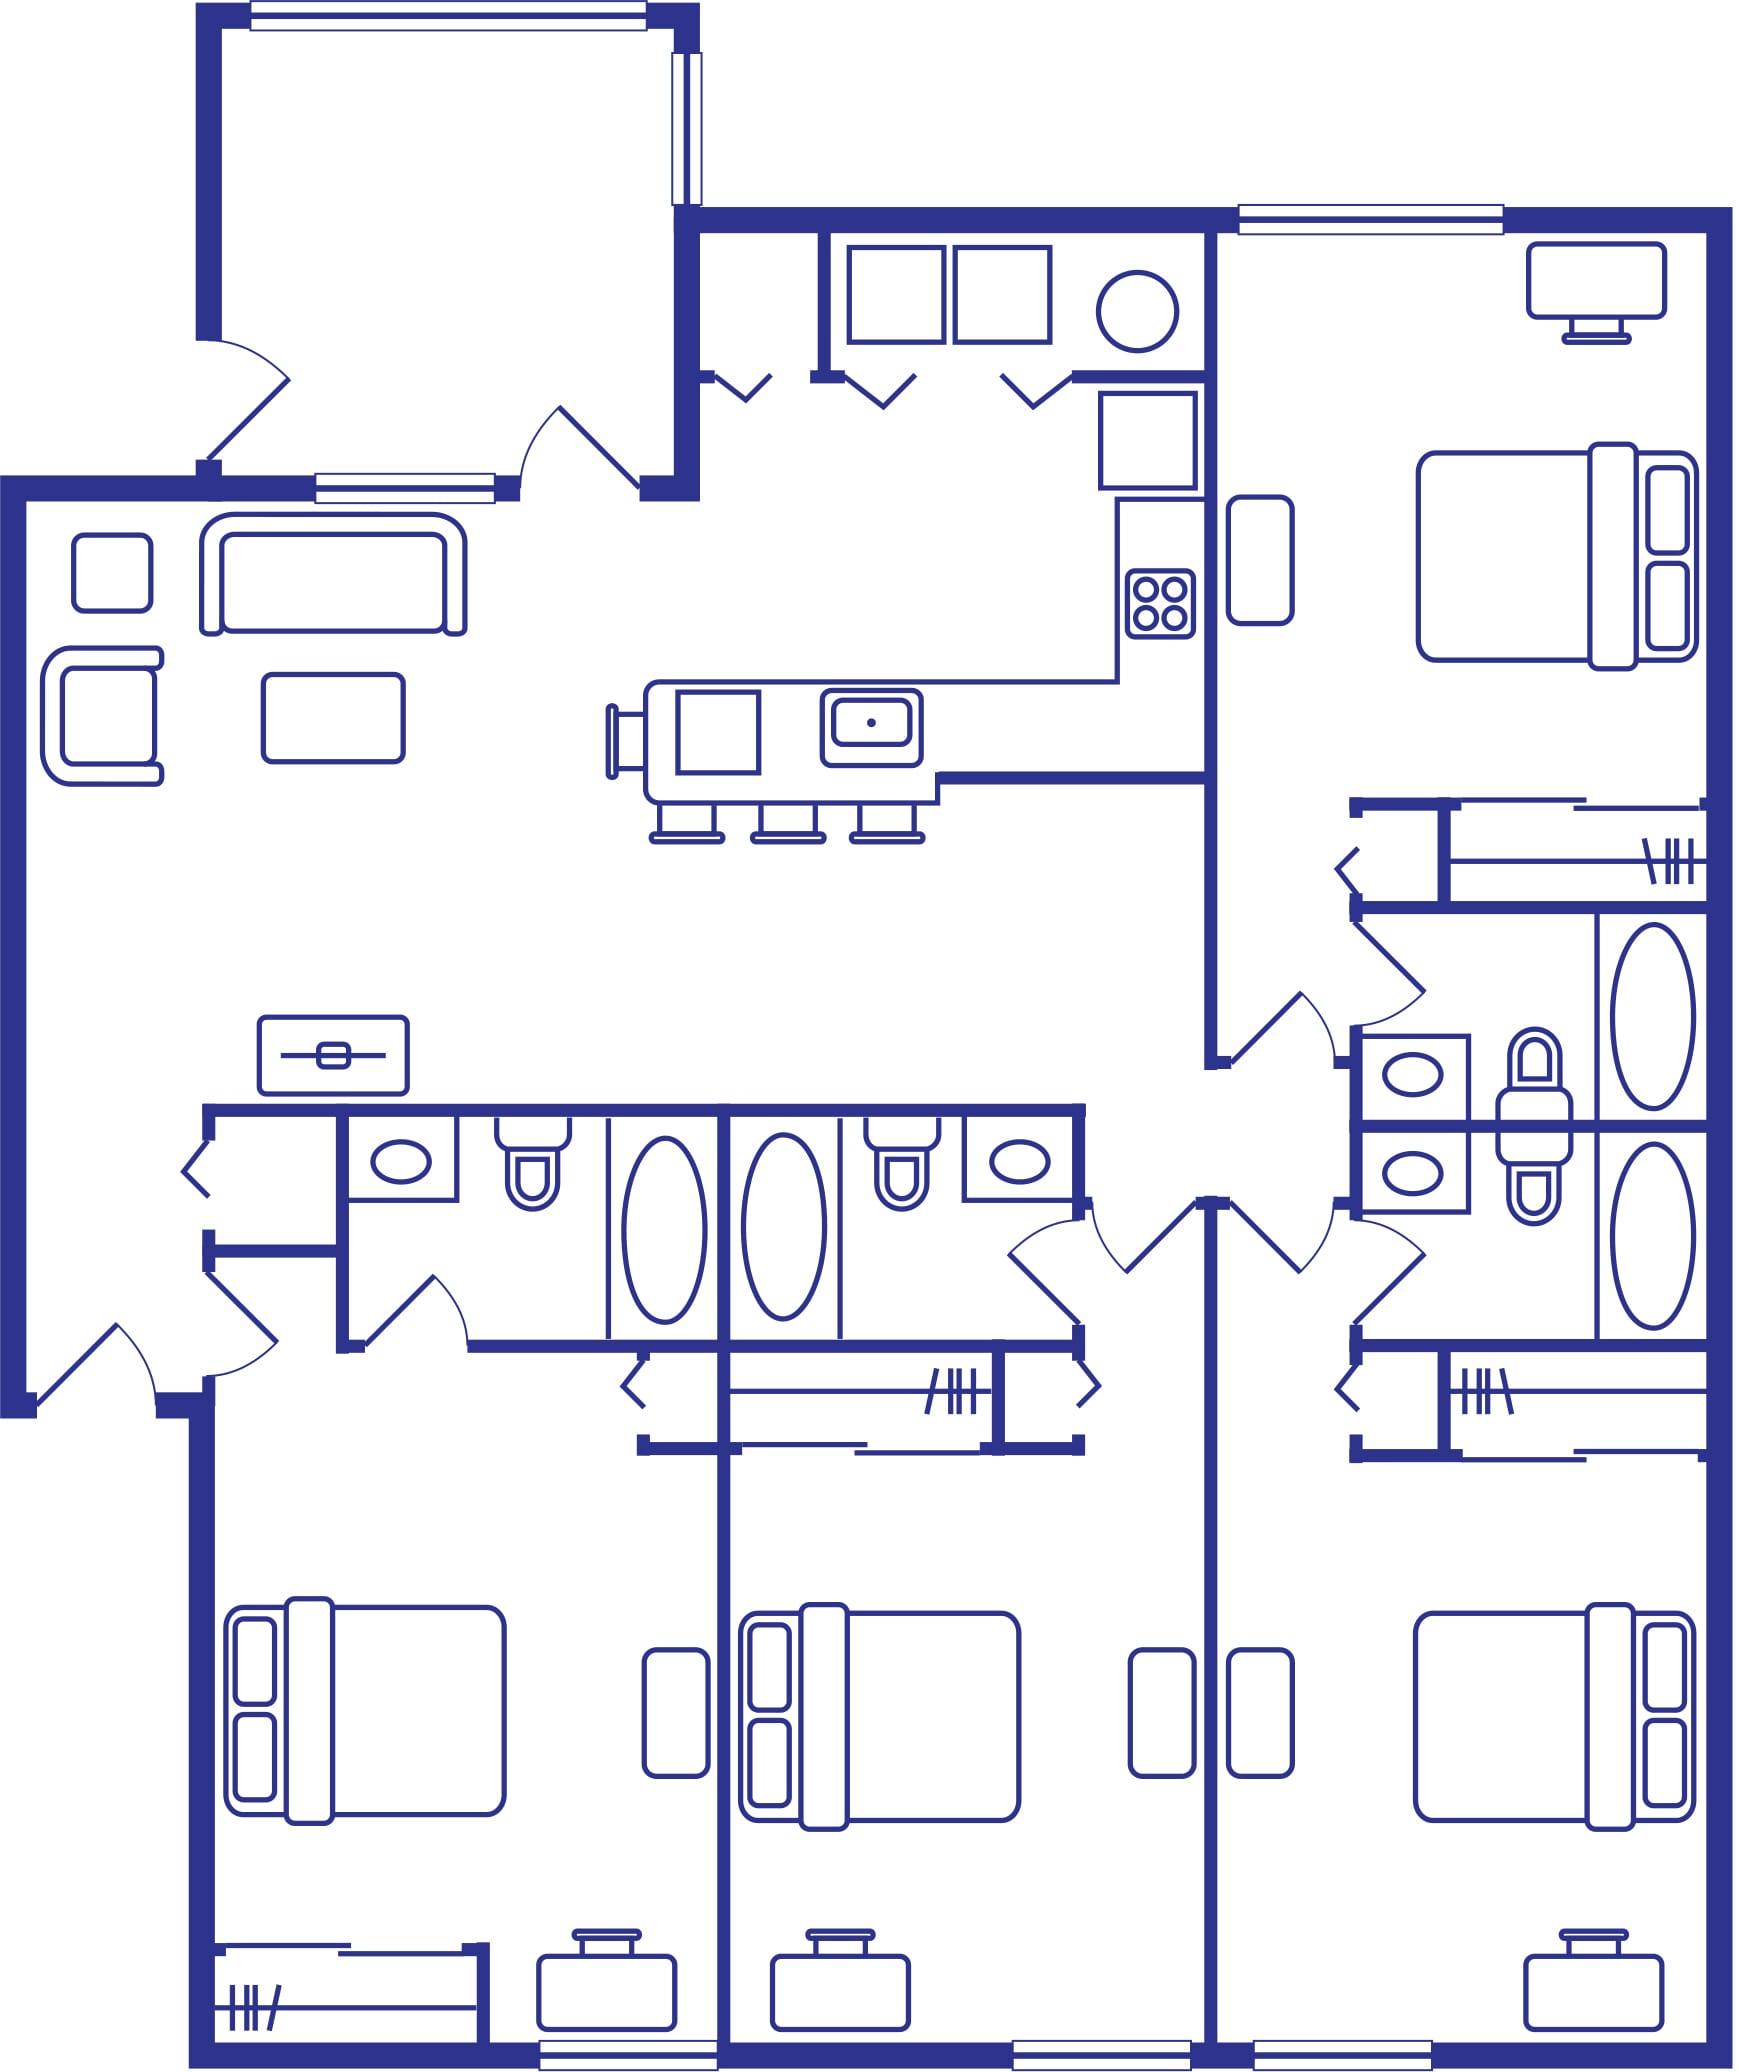 4 Bedroom & 4 Bath Floorplan At Alight West Tenn